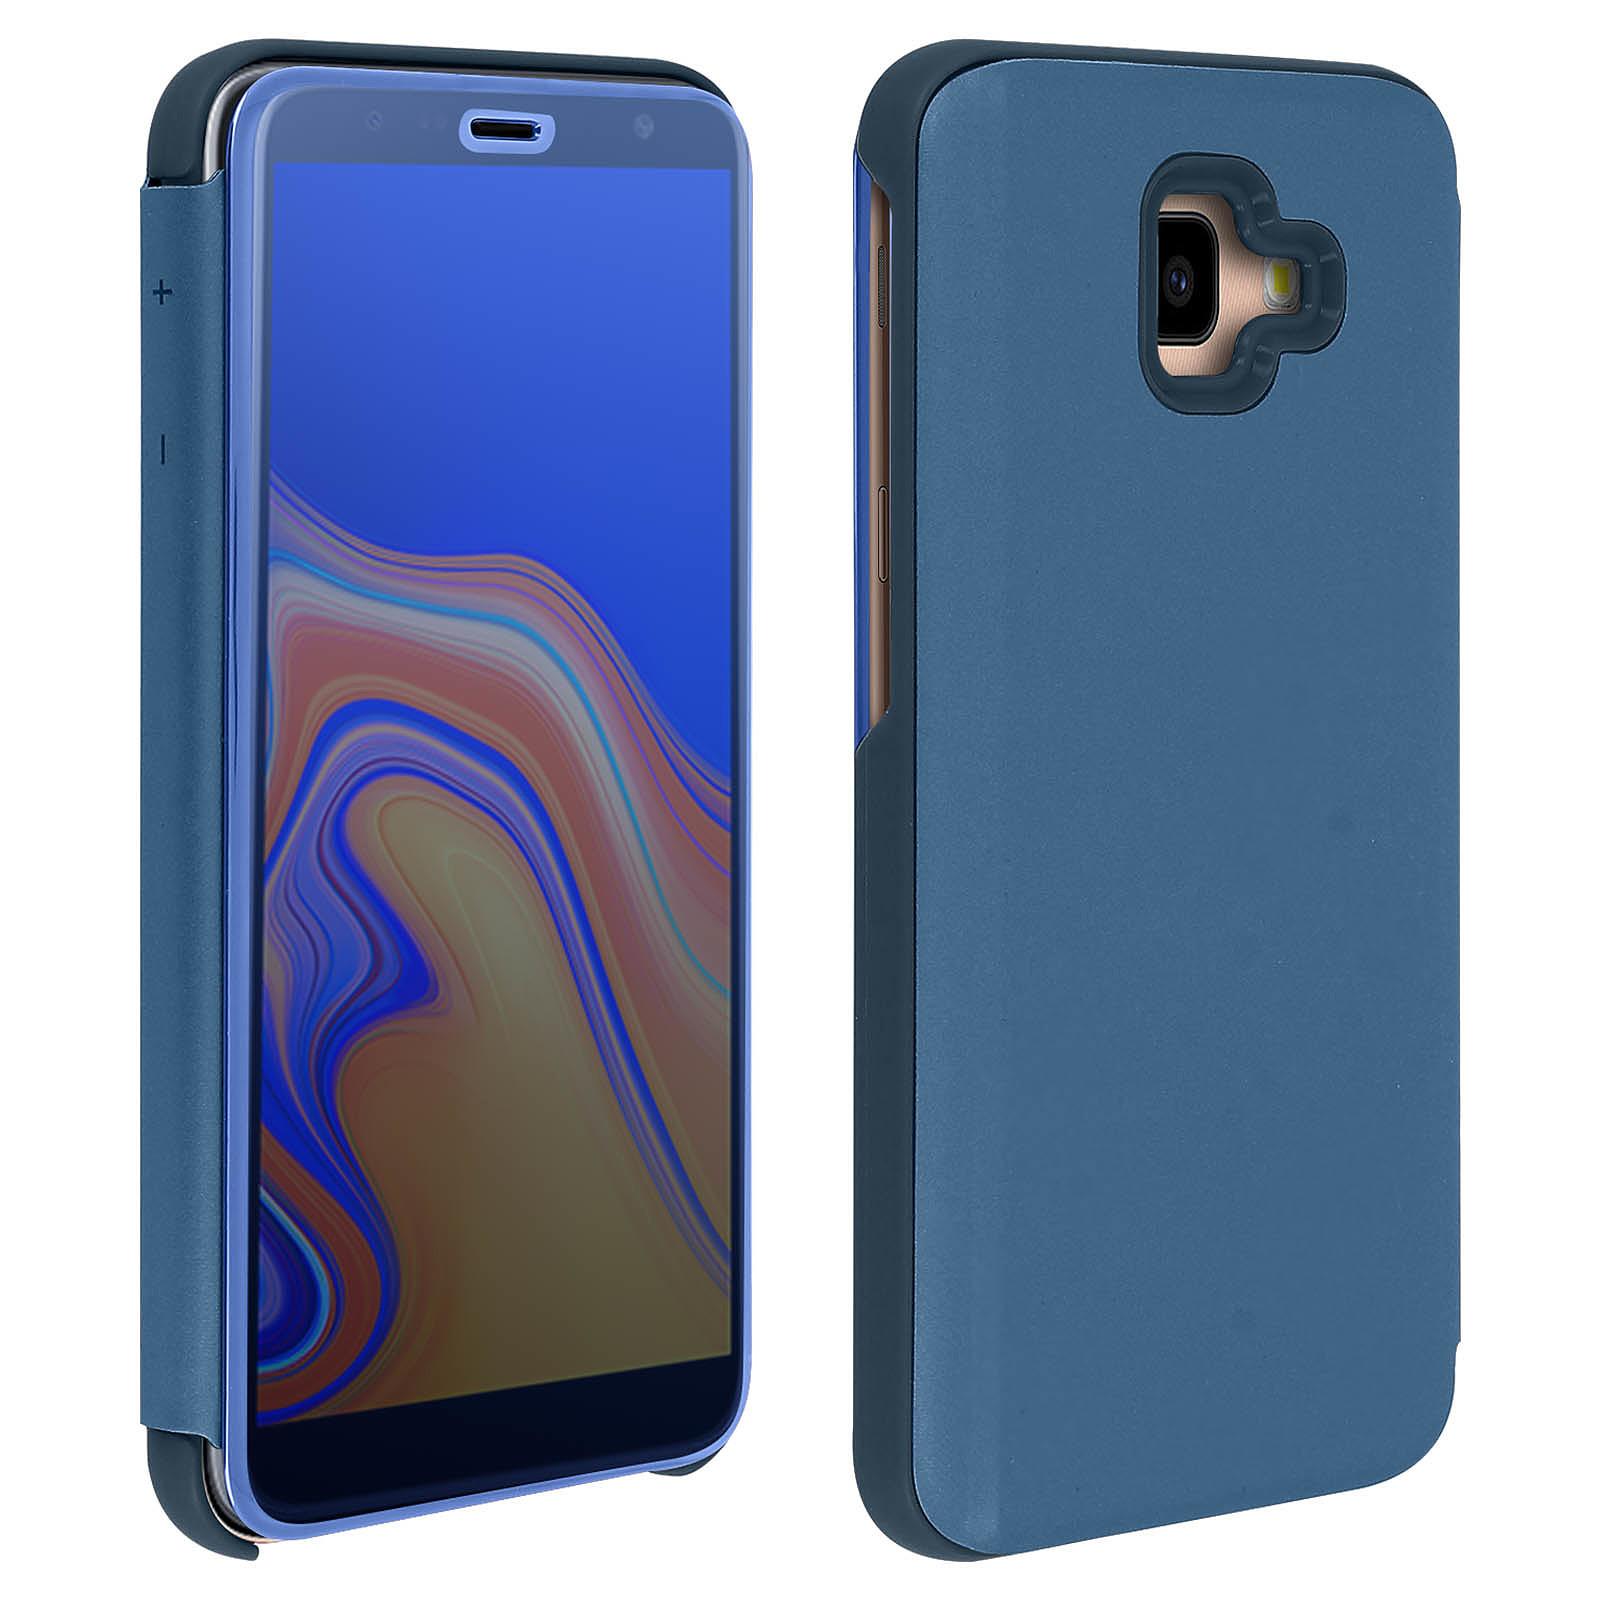 Avizar Etui folio Bleu Nuit pour Samsung Galaxy J4 Plus